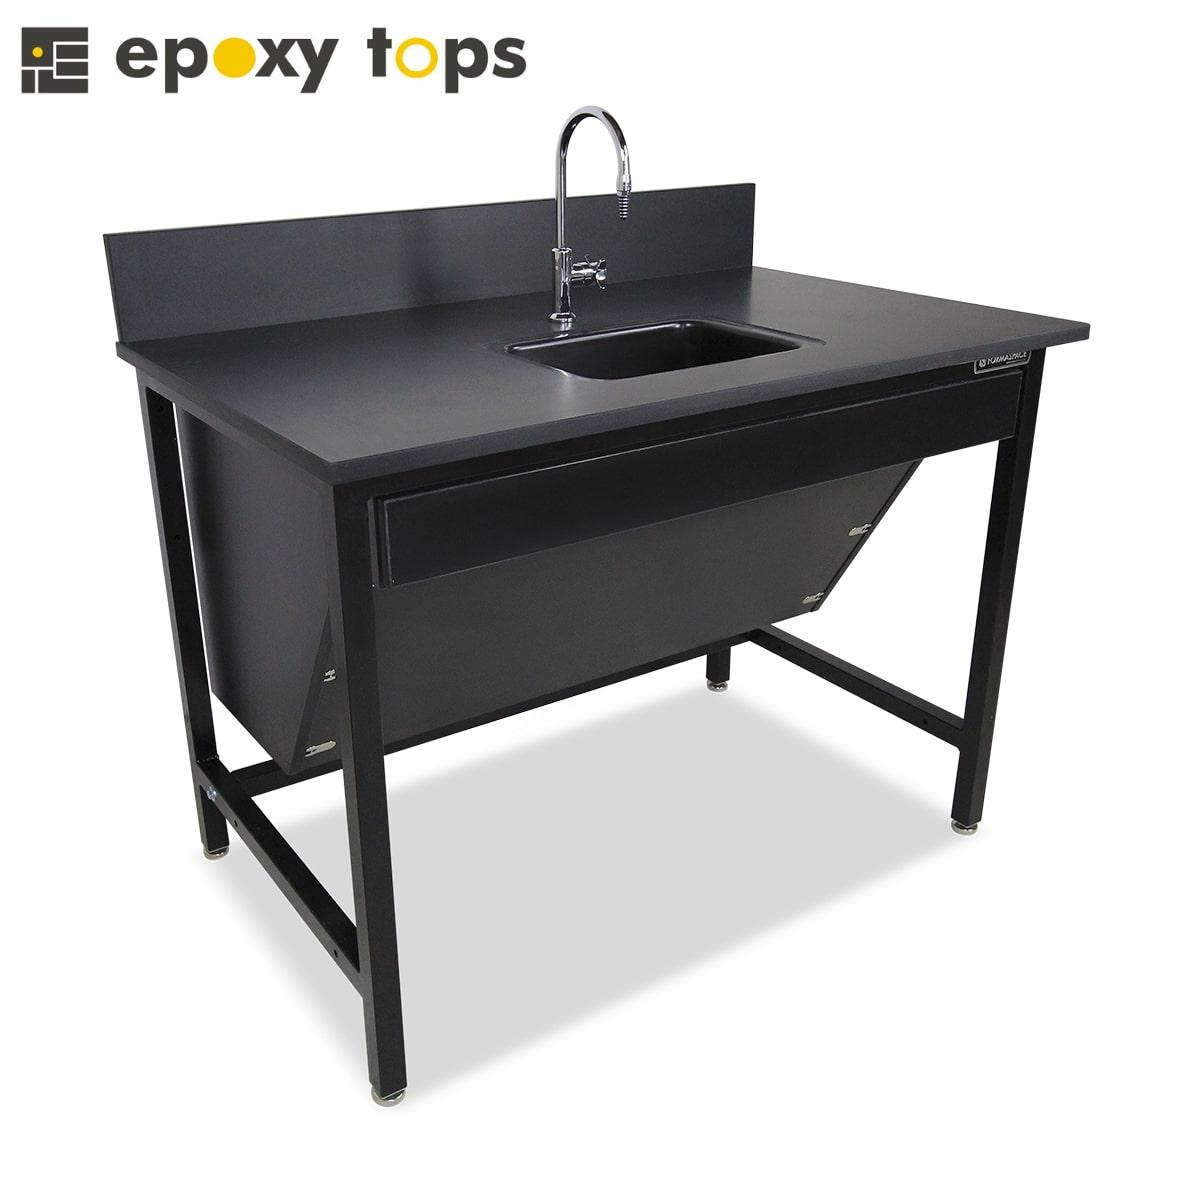 ada compliant wet lab workbench